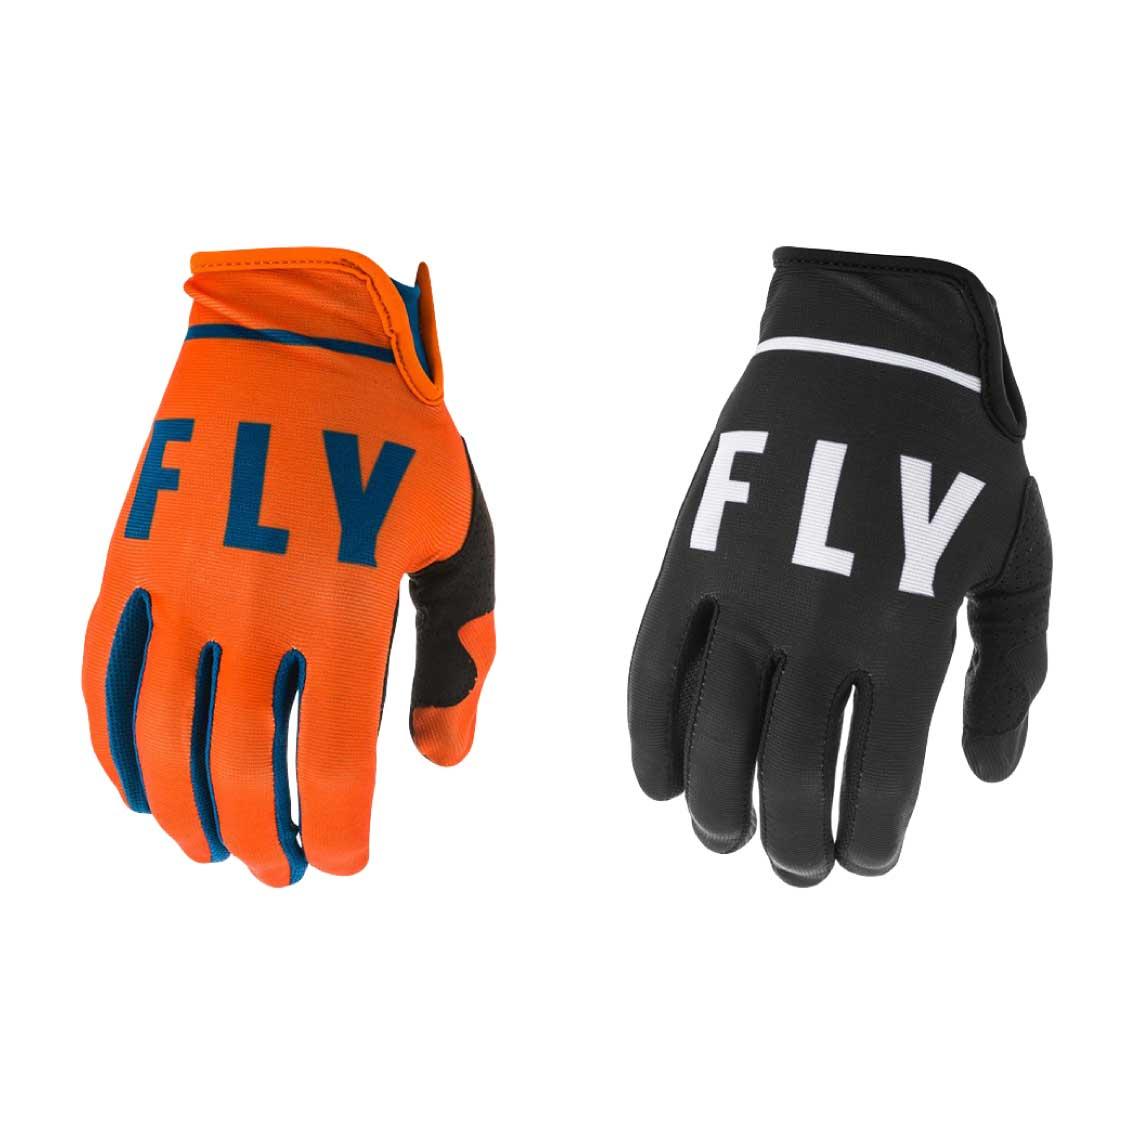 Fly Lite Hydrogen Gloves Image